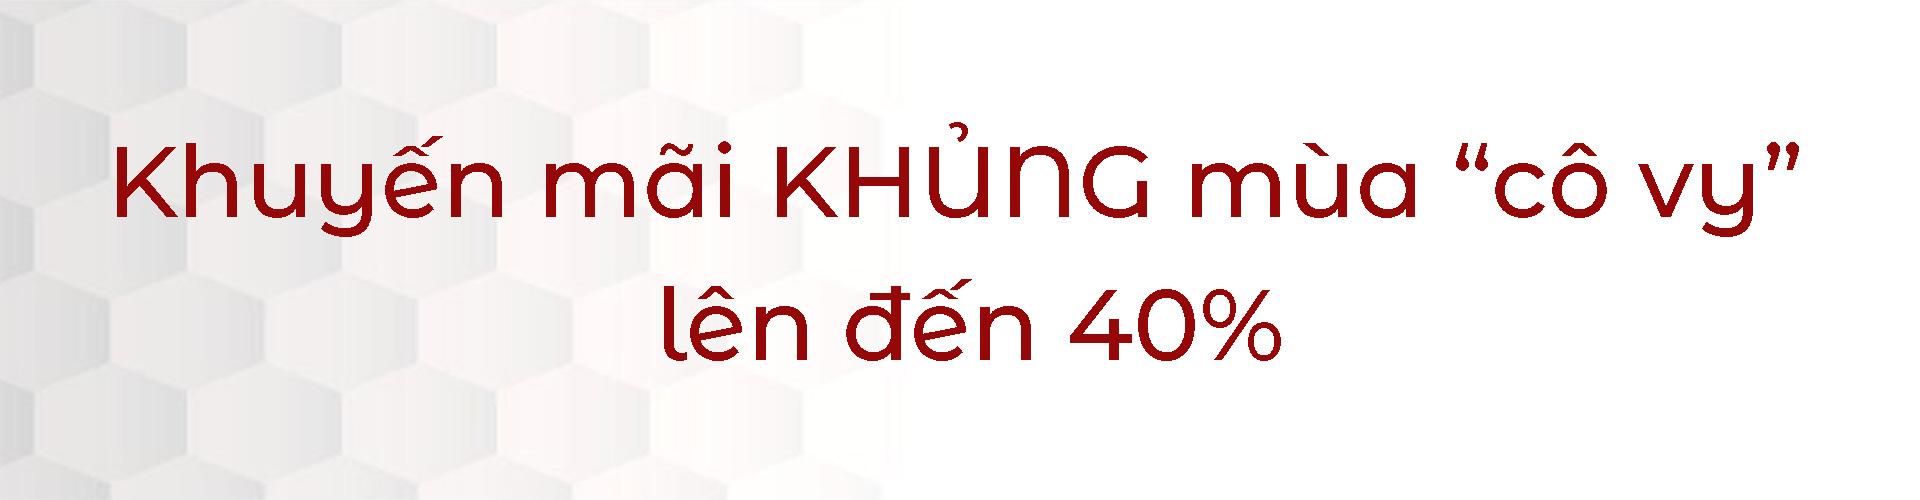 banner center 1920x500 3